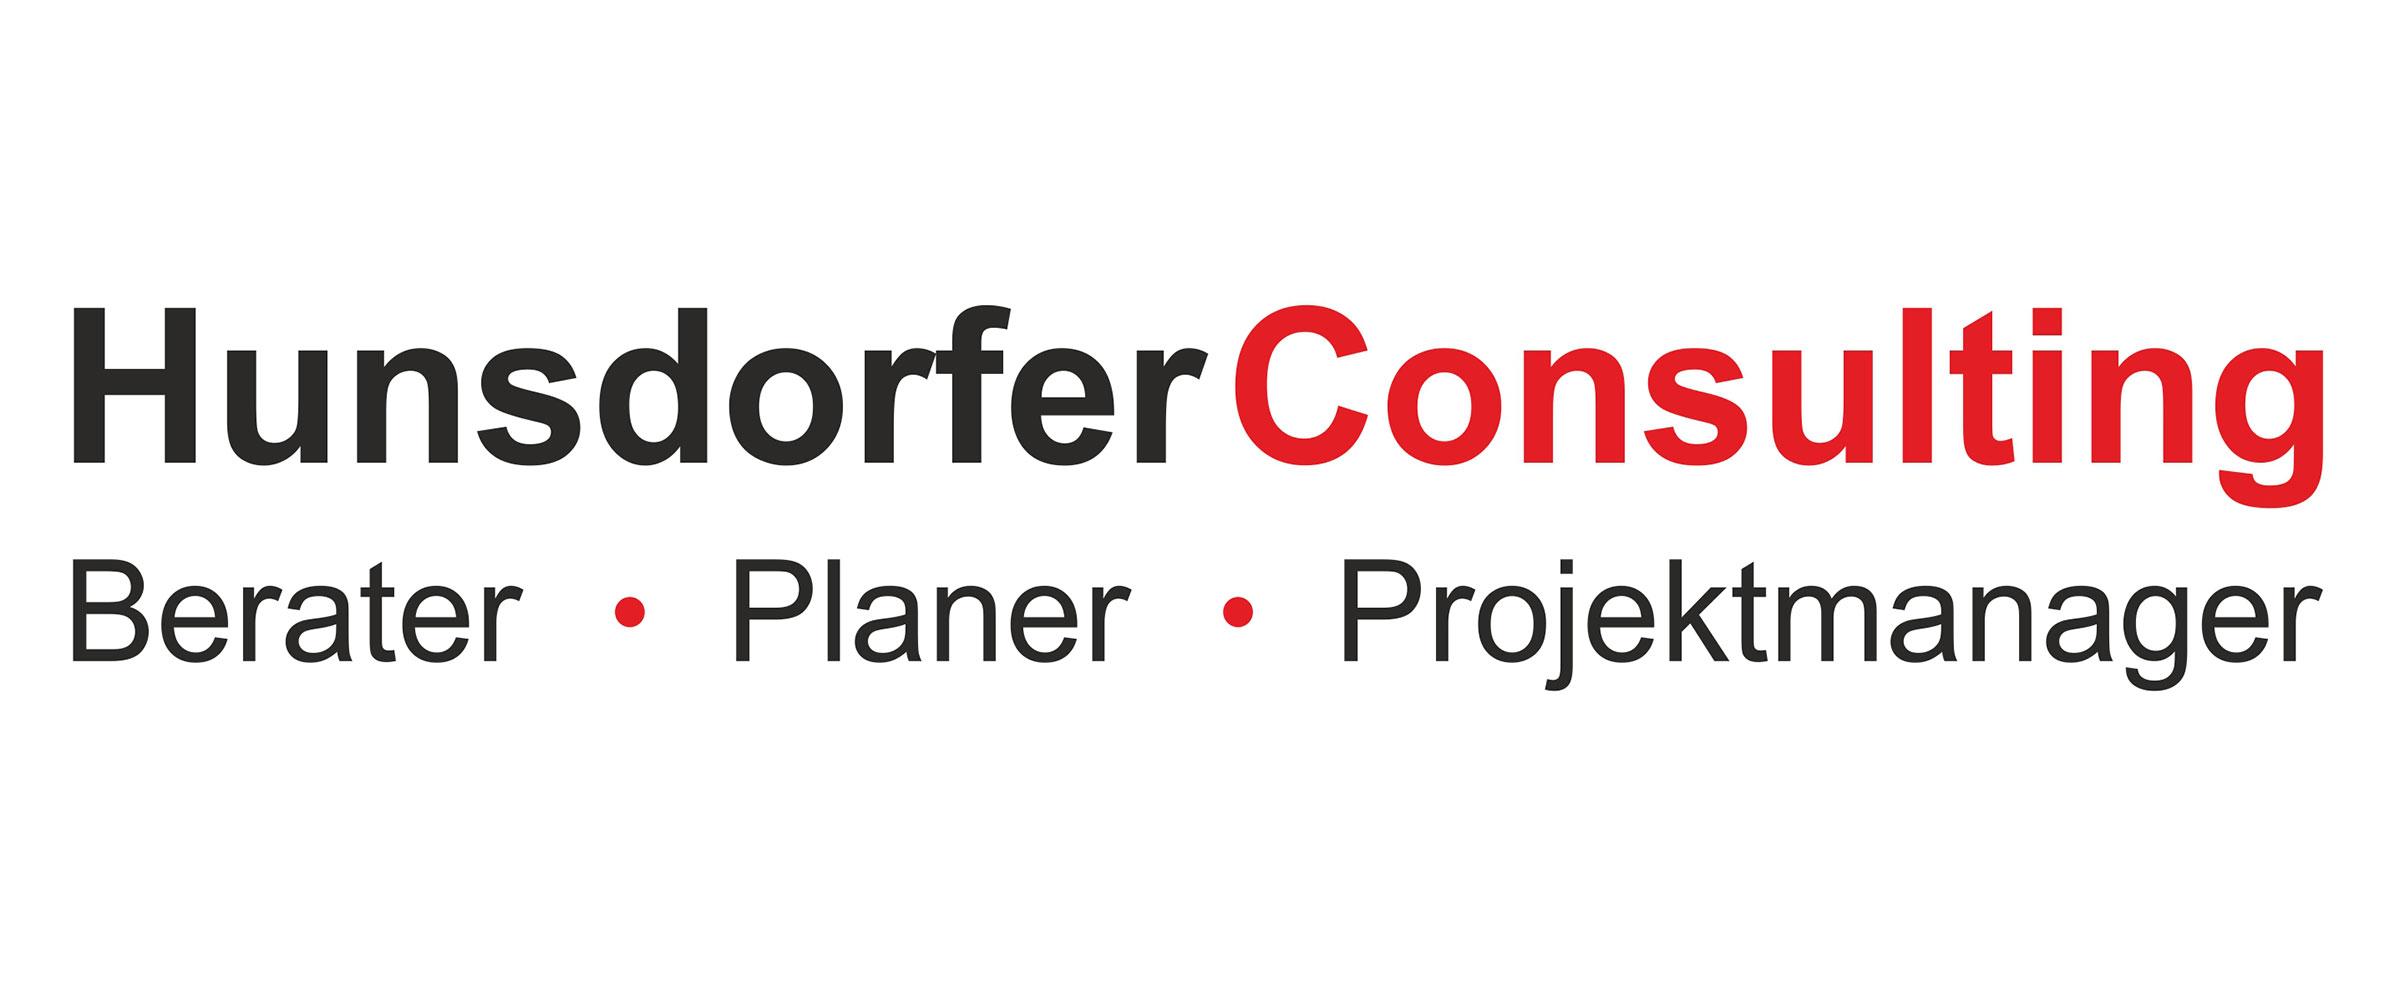 Hunsdorfer Consulting GmbH